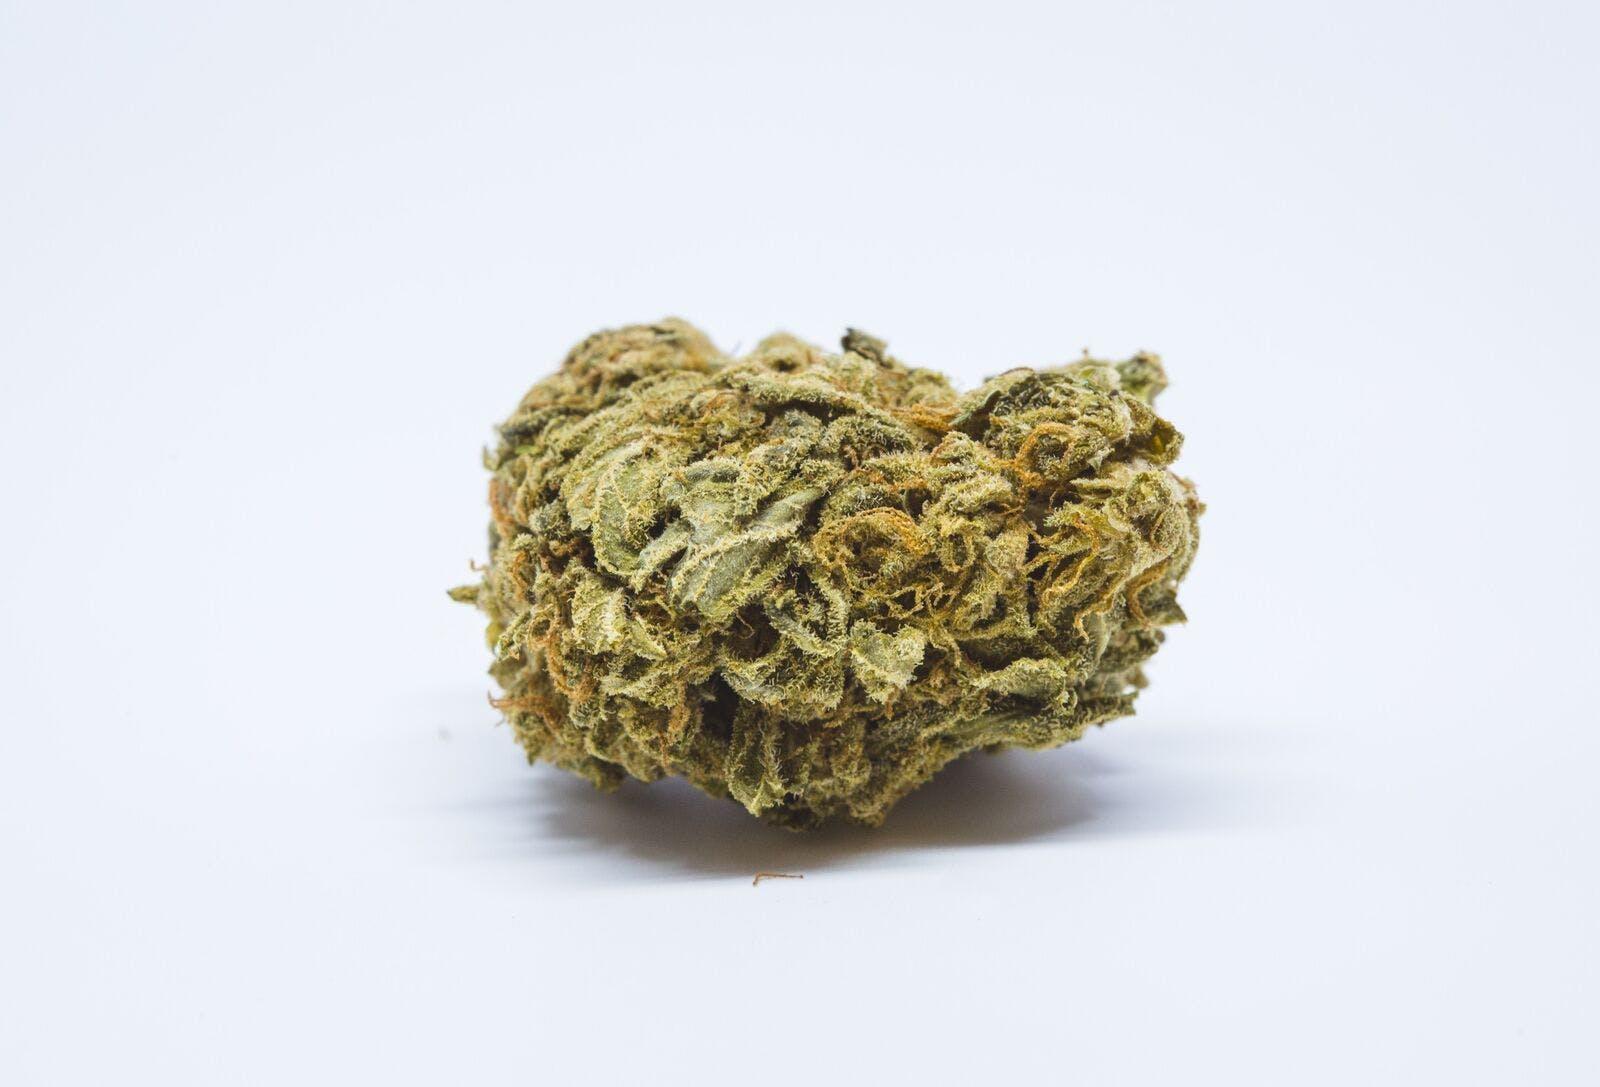 Blueberry Dream Weed; Blueberry Dream Cannabis Strain; Blueberry Dream Sativa Marijuana Strain